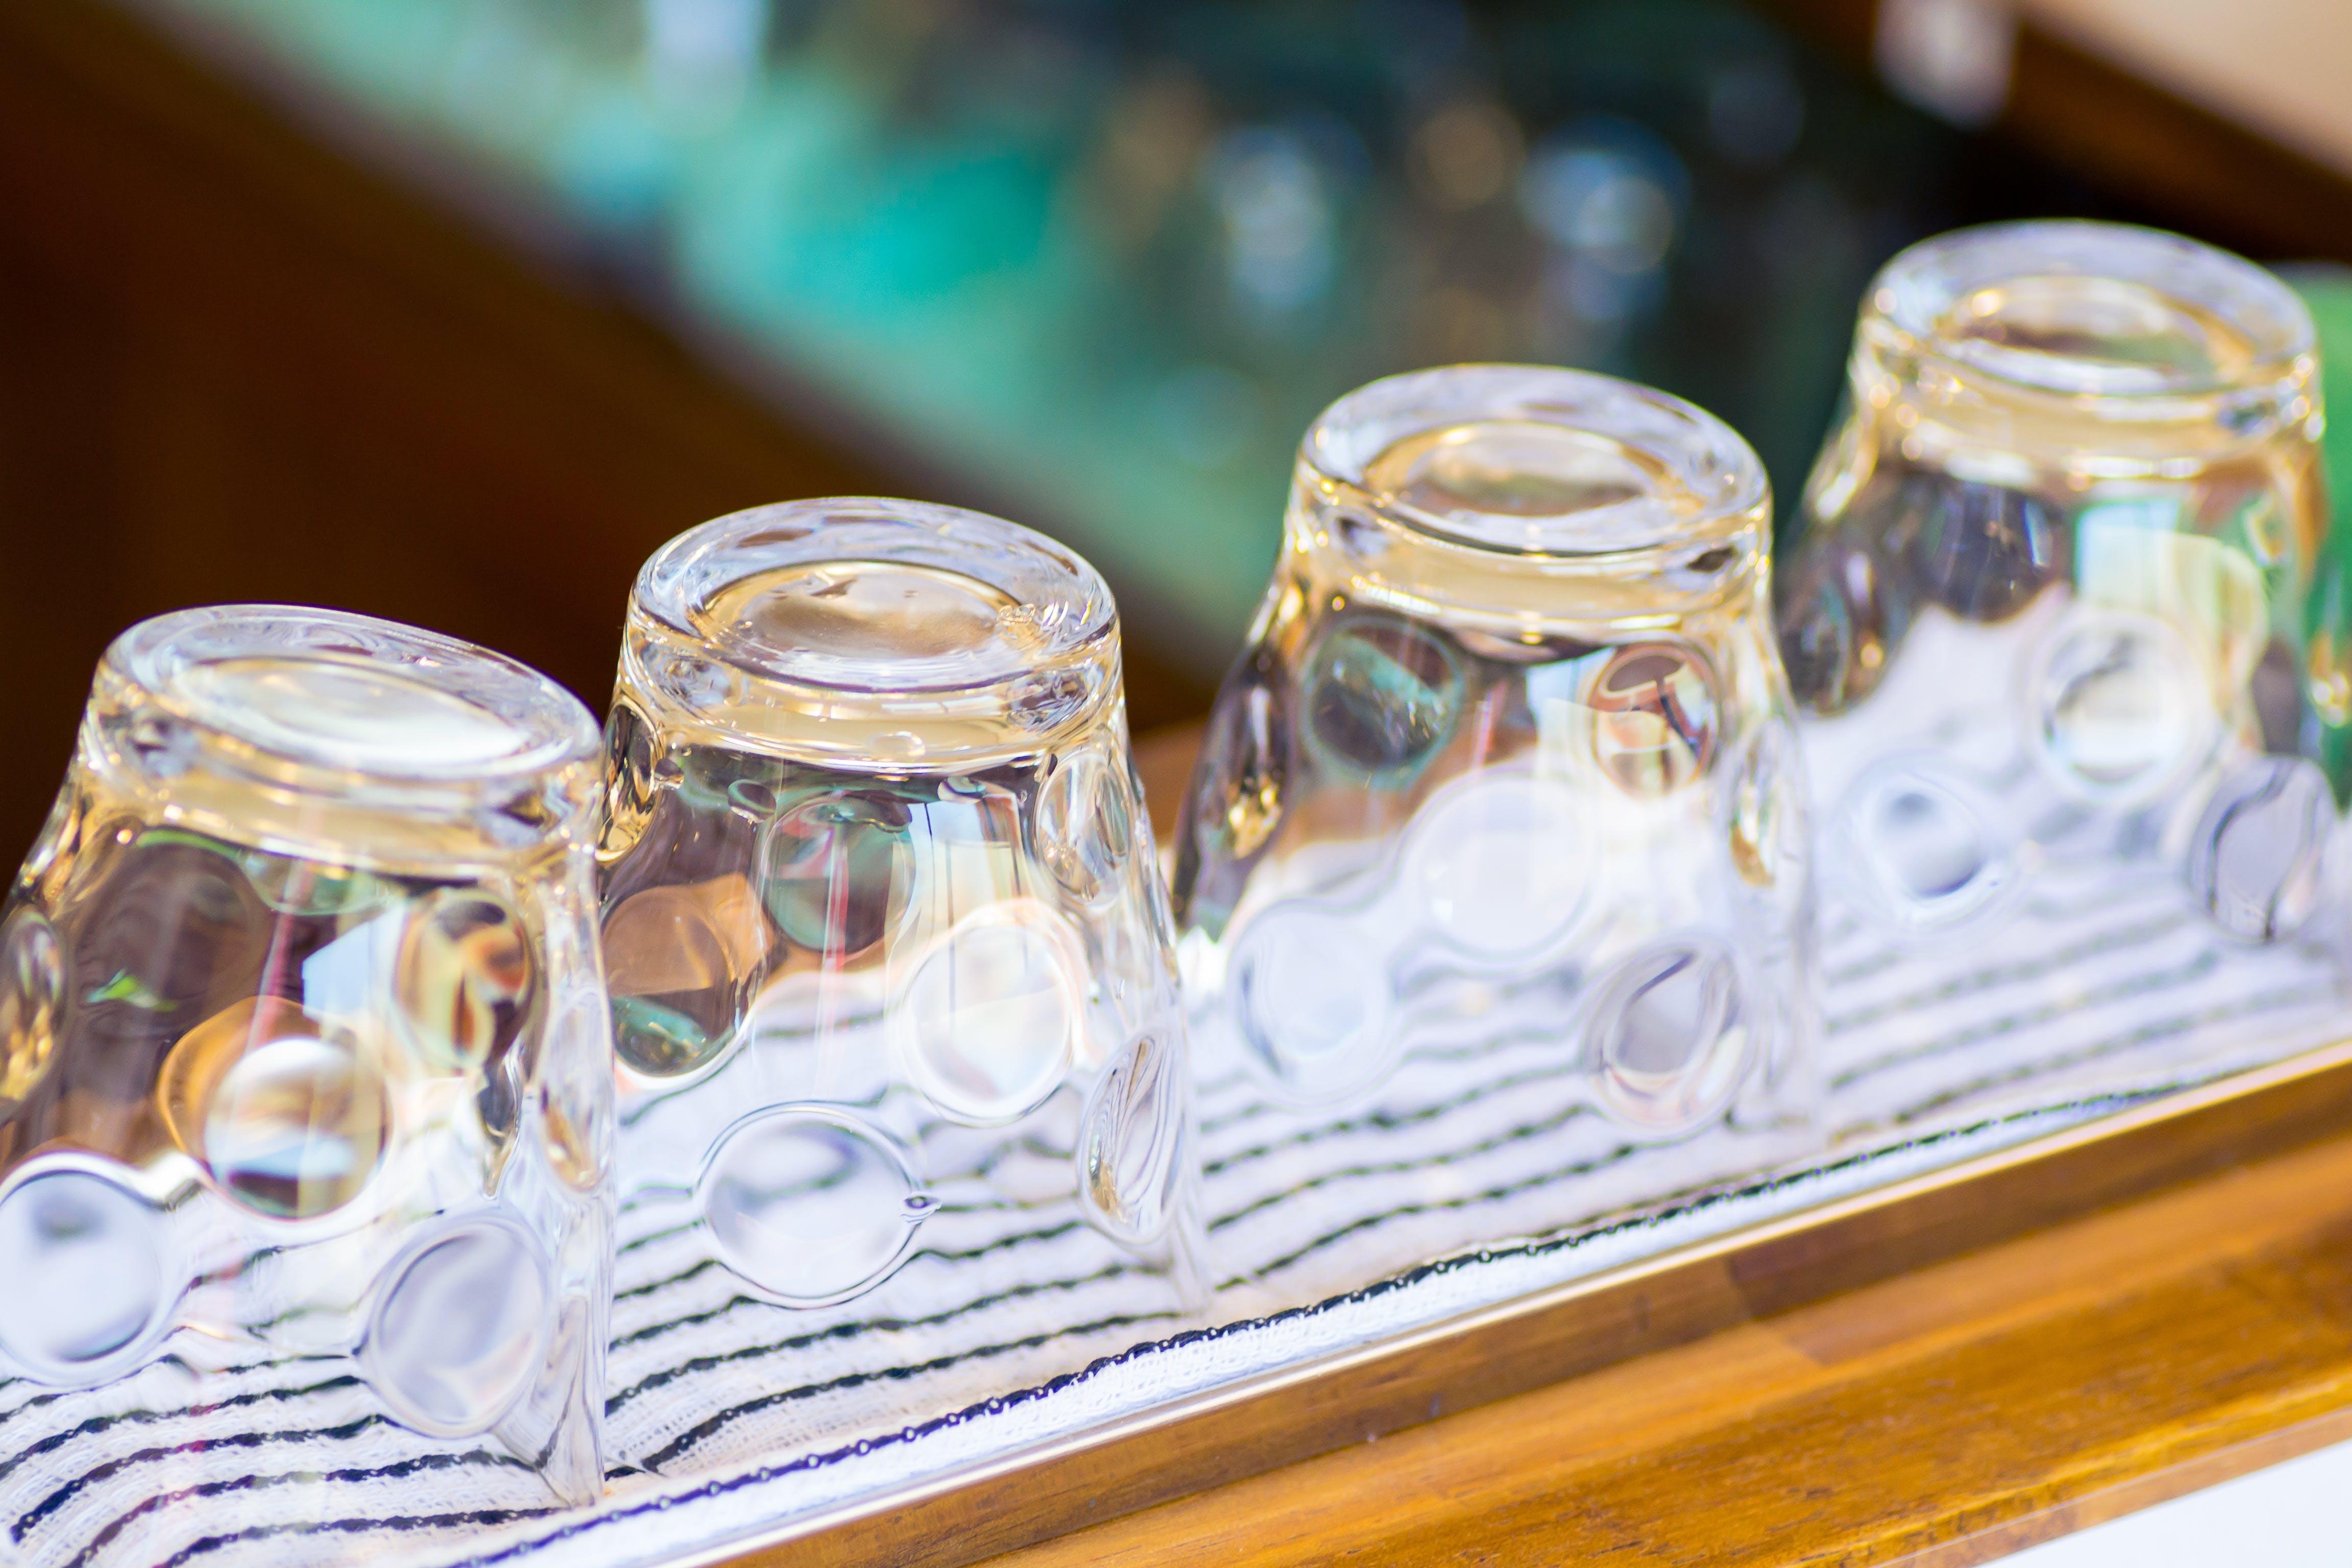 Free stock photo of light, cup, glass, café